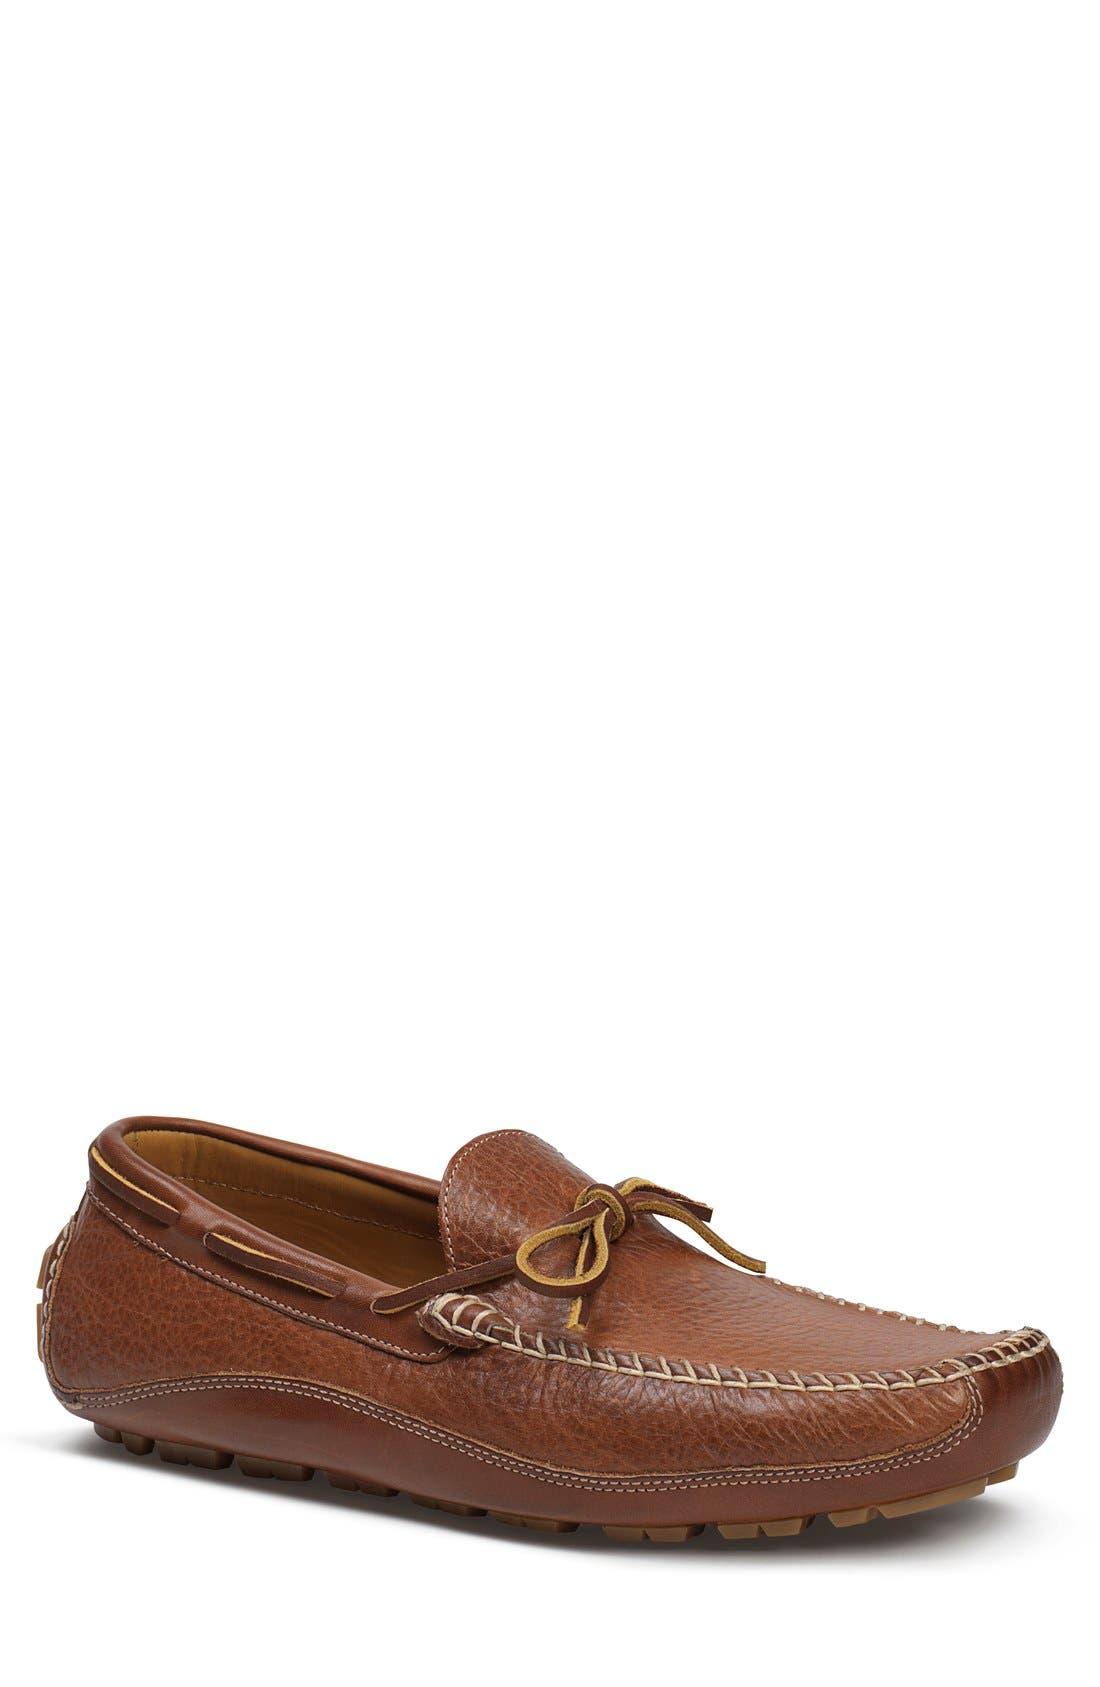 TRASK 'Drake' Leather Driving Shoe, Main, color, SADDLE TAN